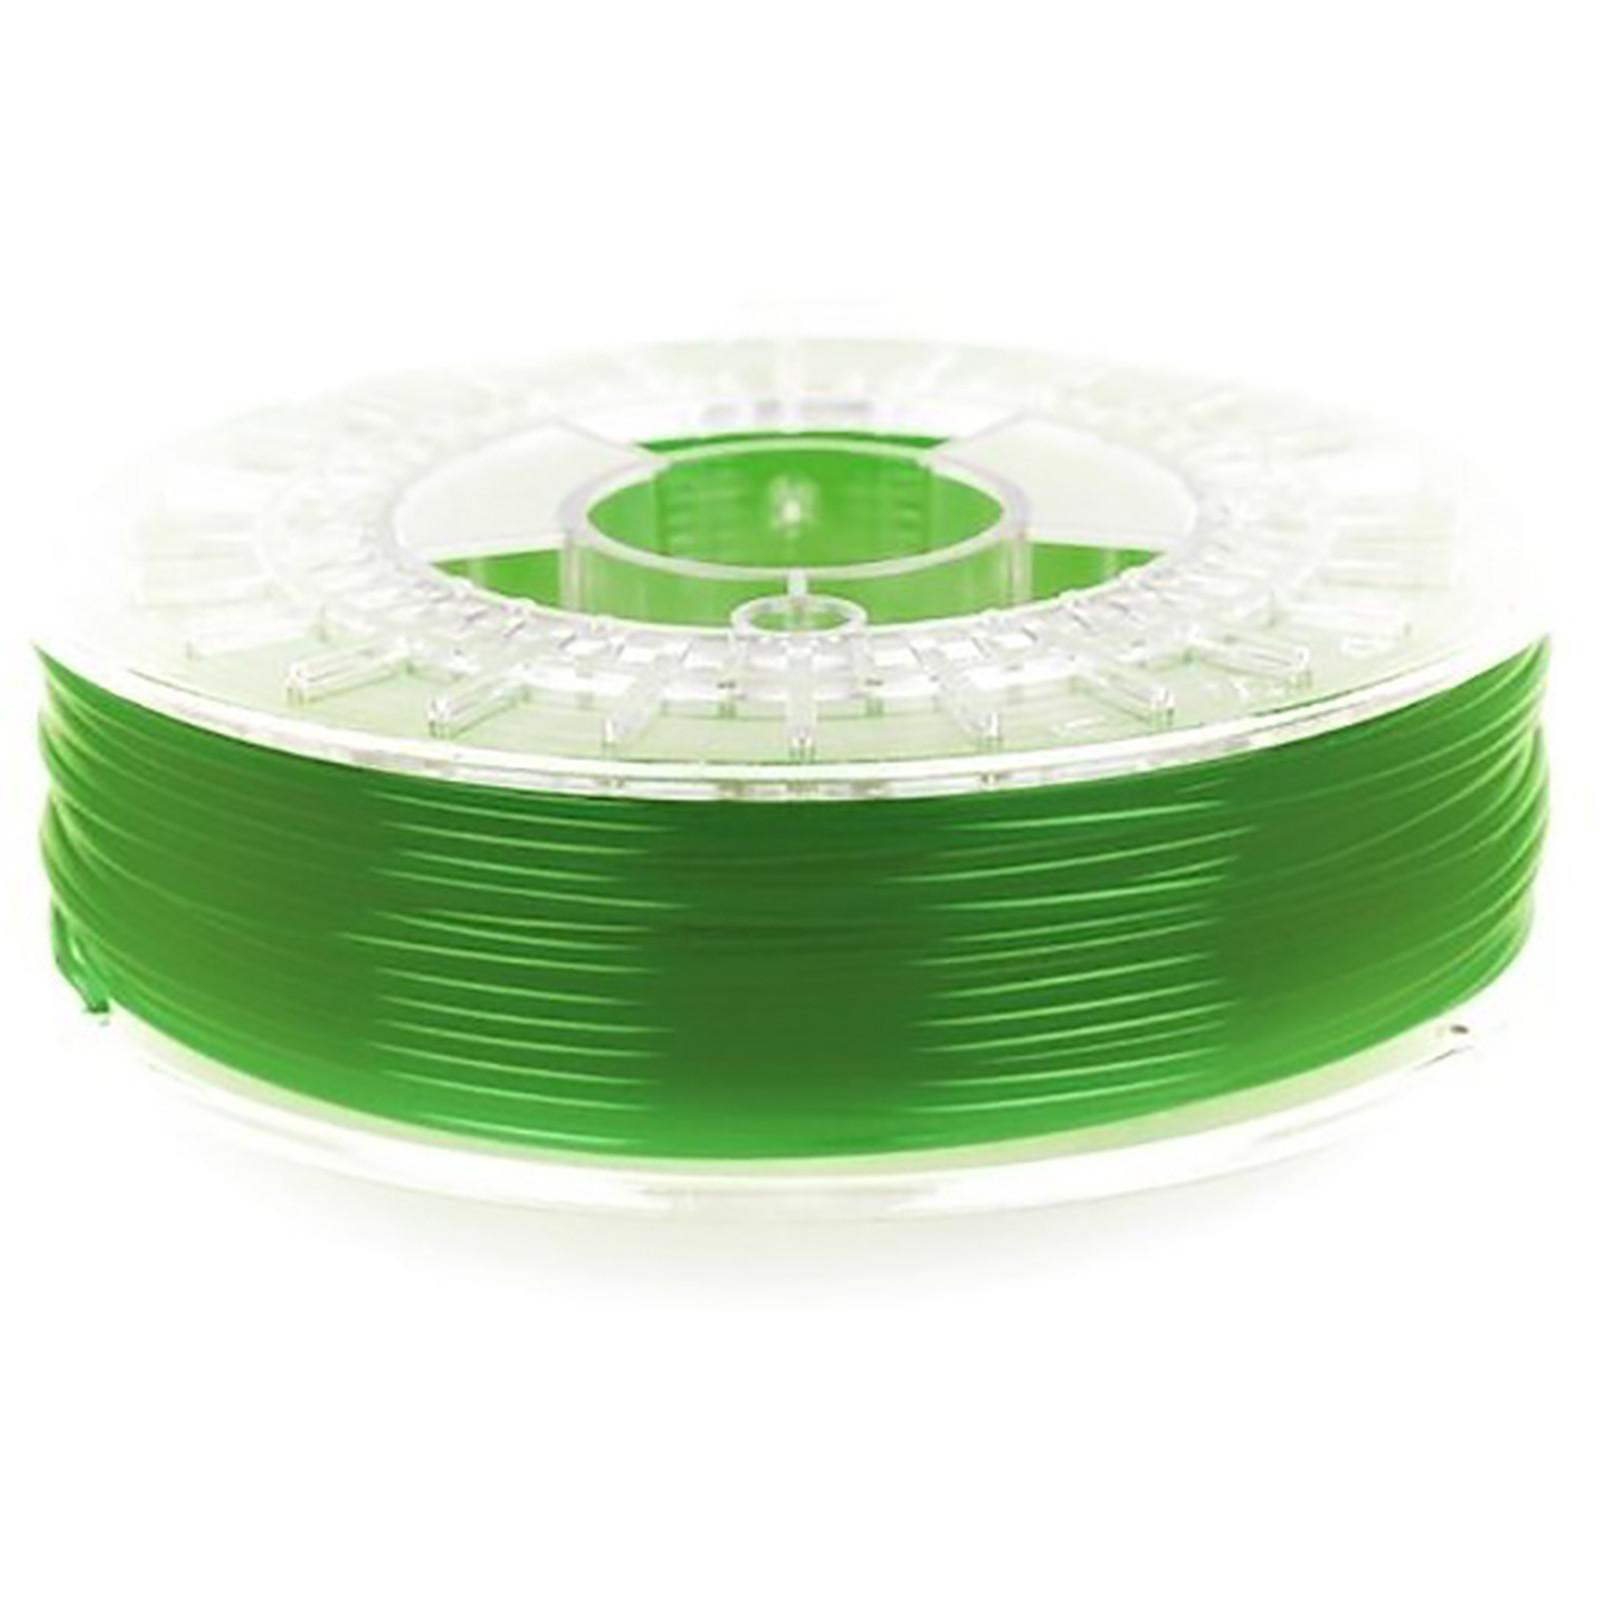 ColorFabb PLA 750g - Vert Transparent